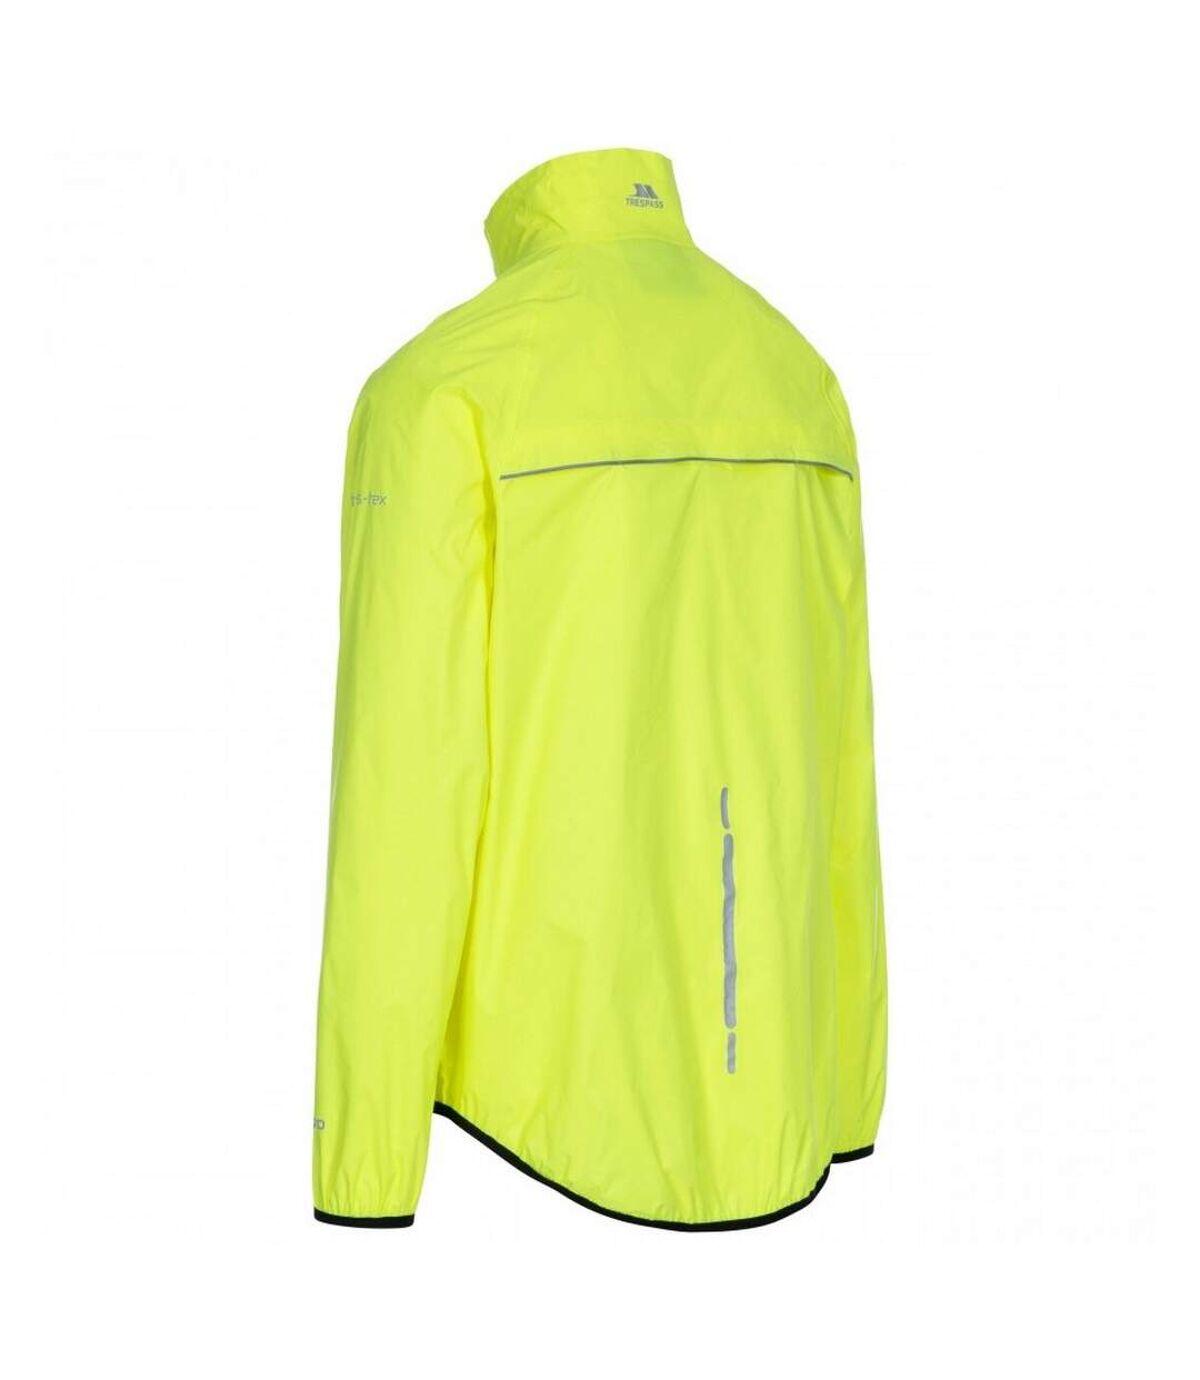 Trespass Mens Retract Hi-Vis Packaway Waterproof Jacket. (Hi Visibility Yellow) - UTTP4736